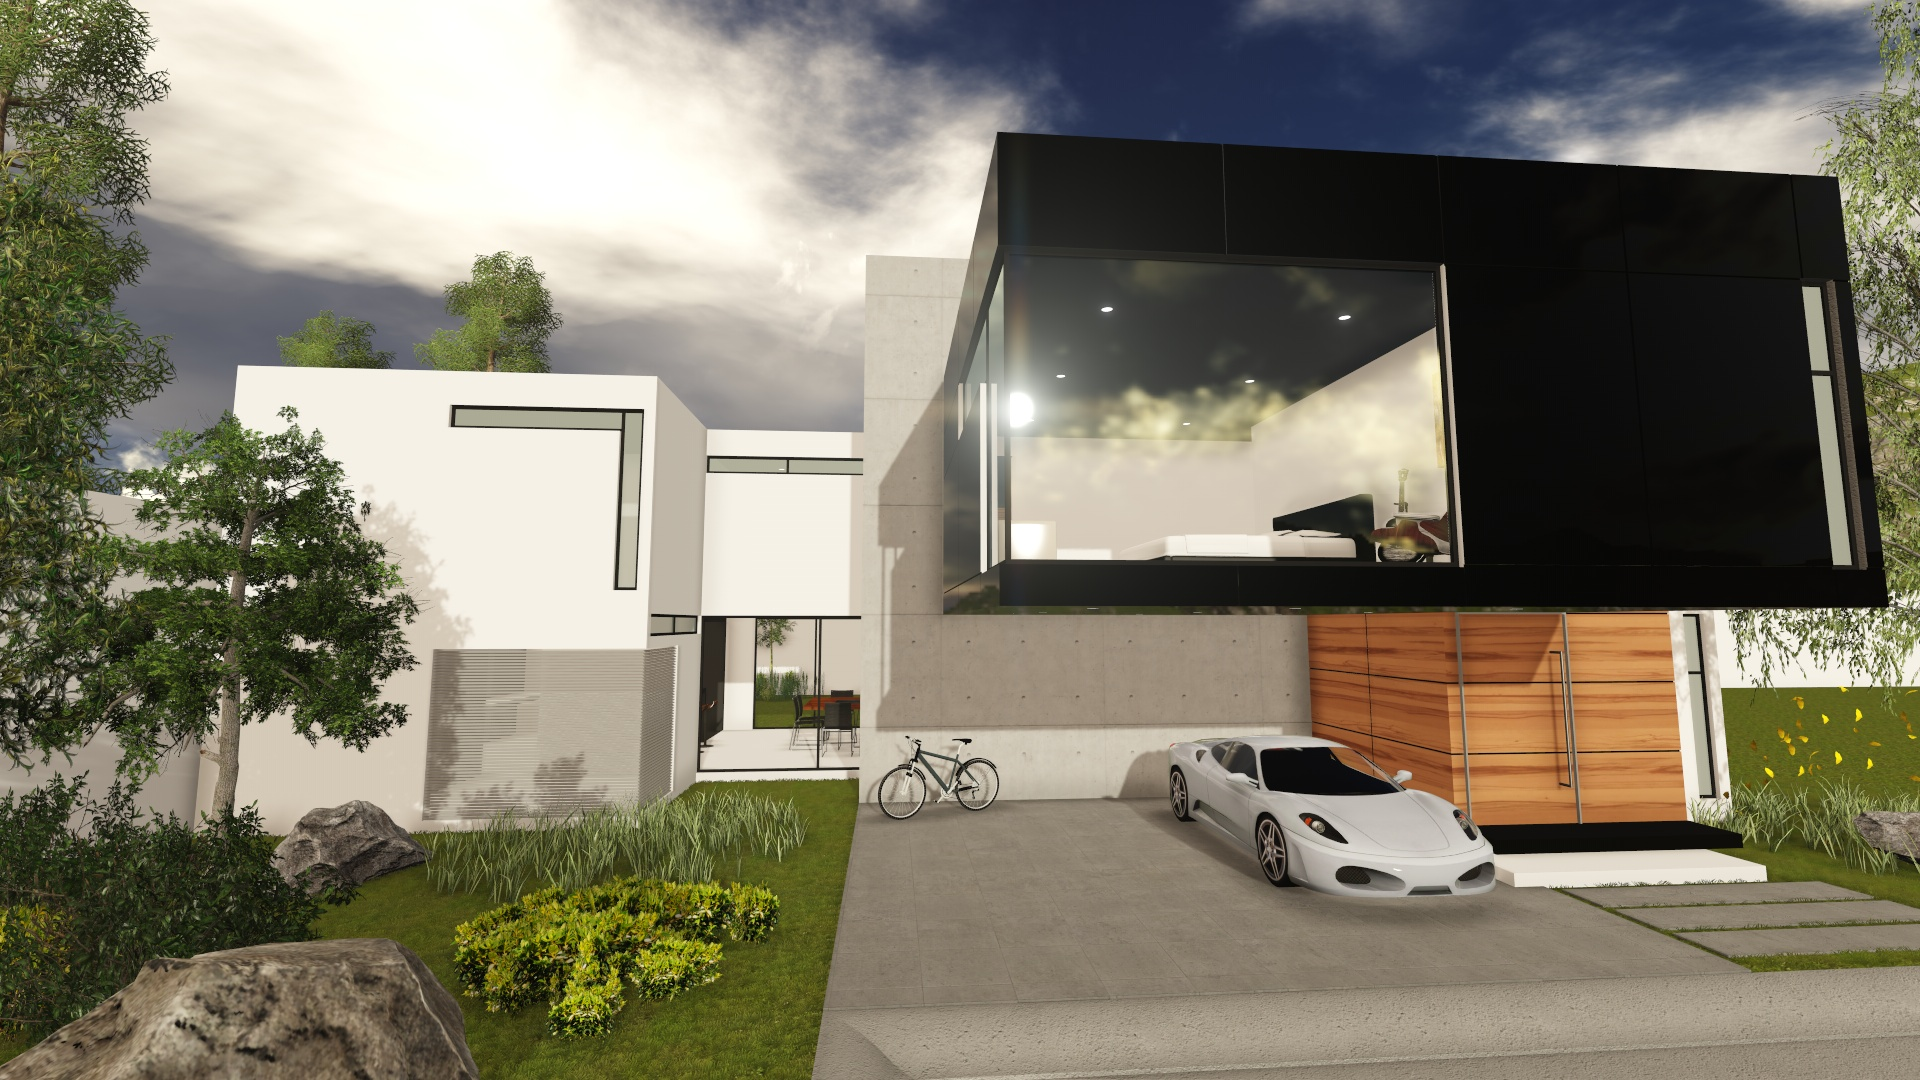 MZ-house / MEGA arquitectura